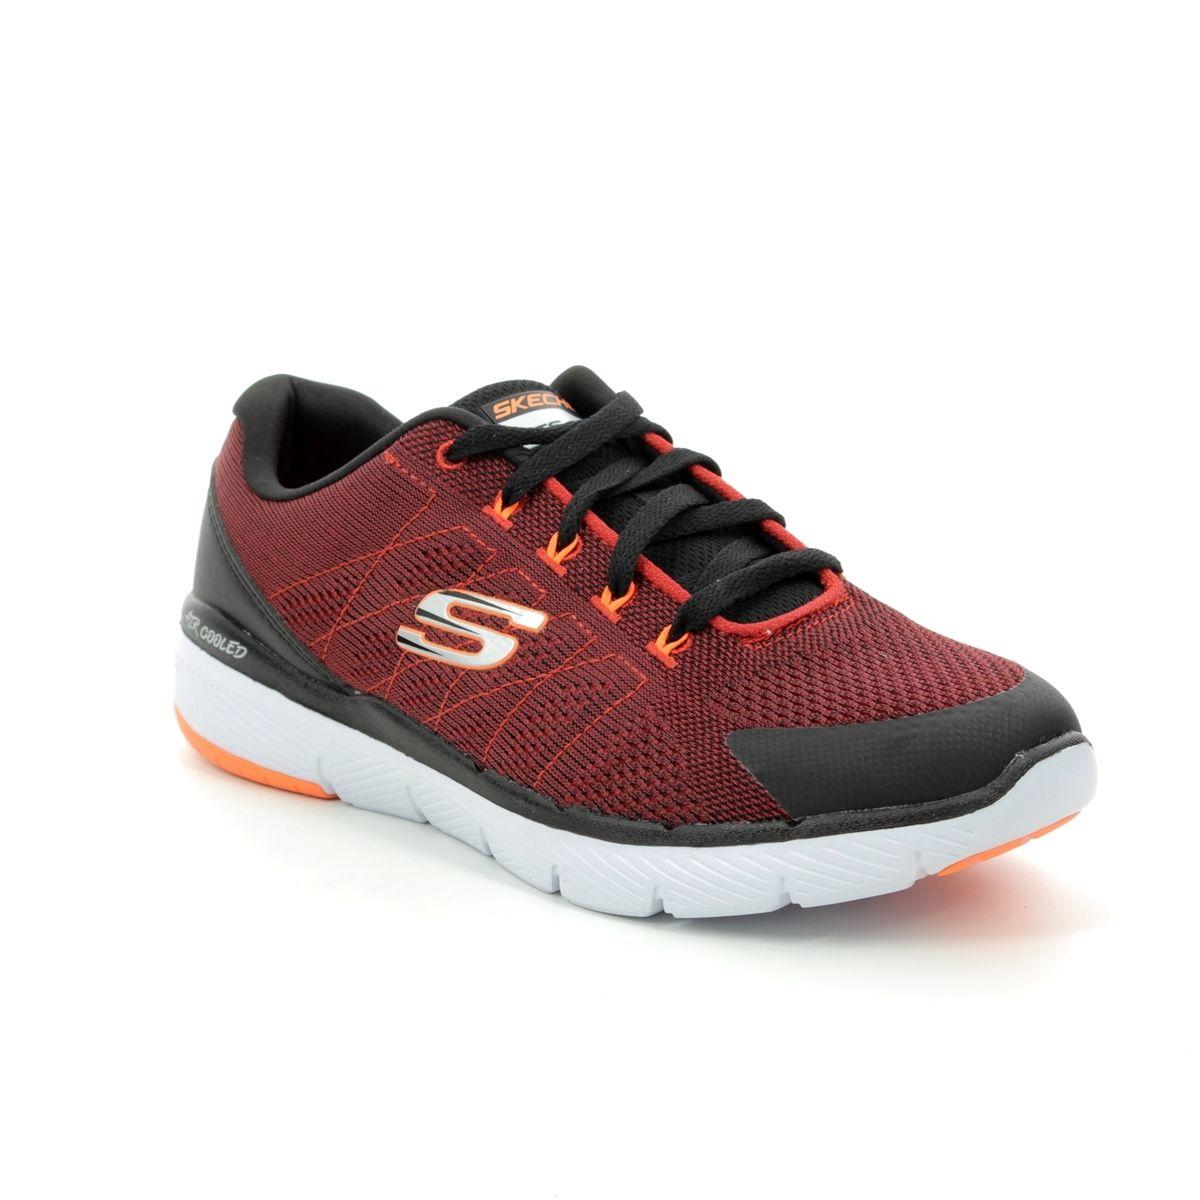 06d36330b5b6d 98140 Flex Advant Jnr at Begg Shoes & Bags